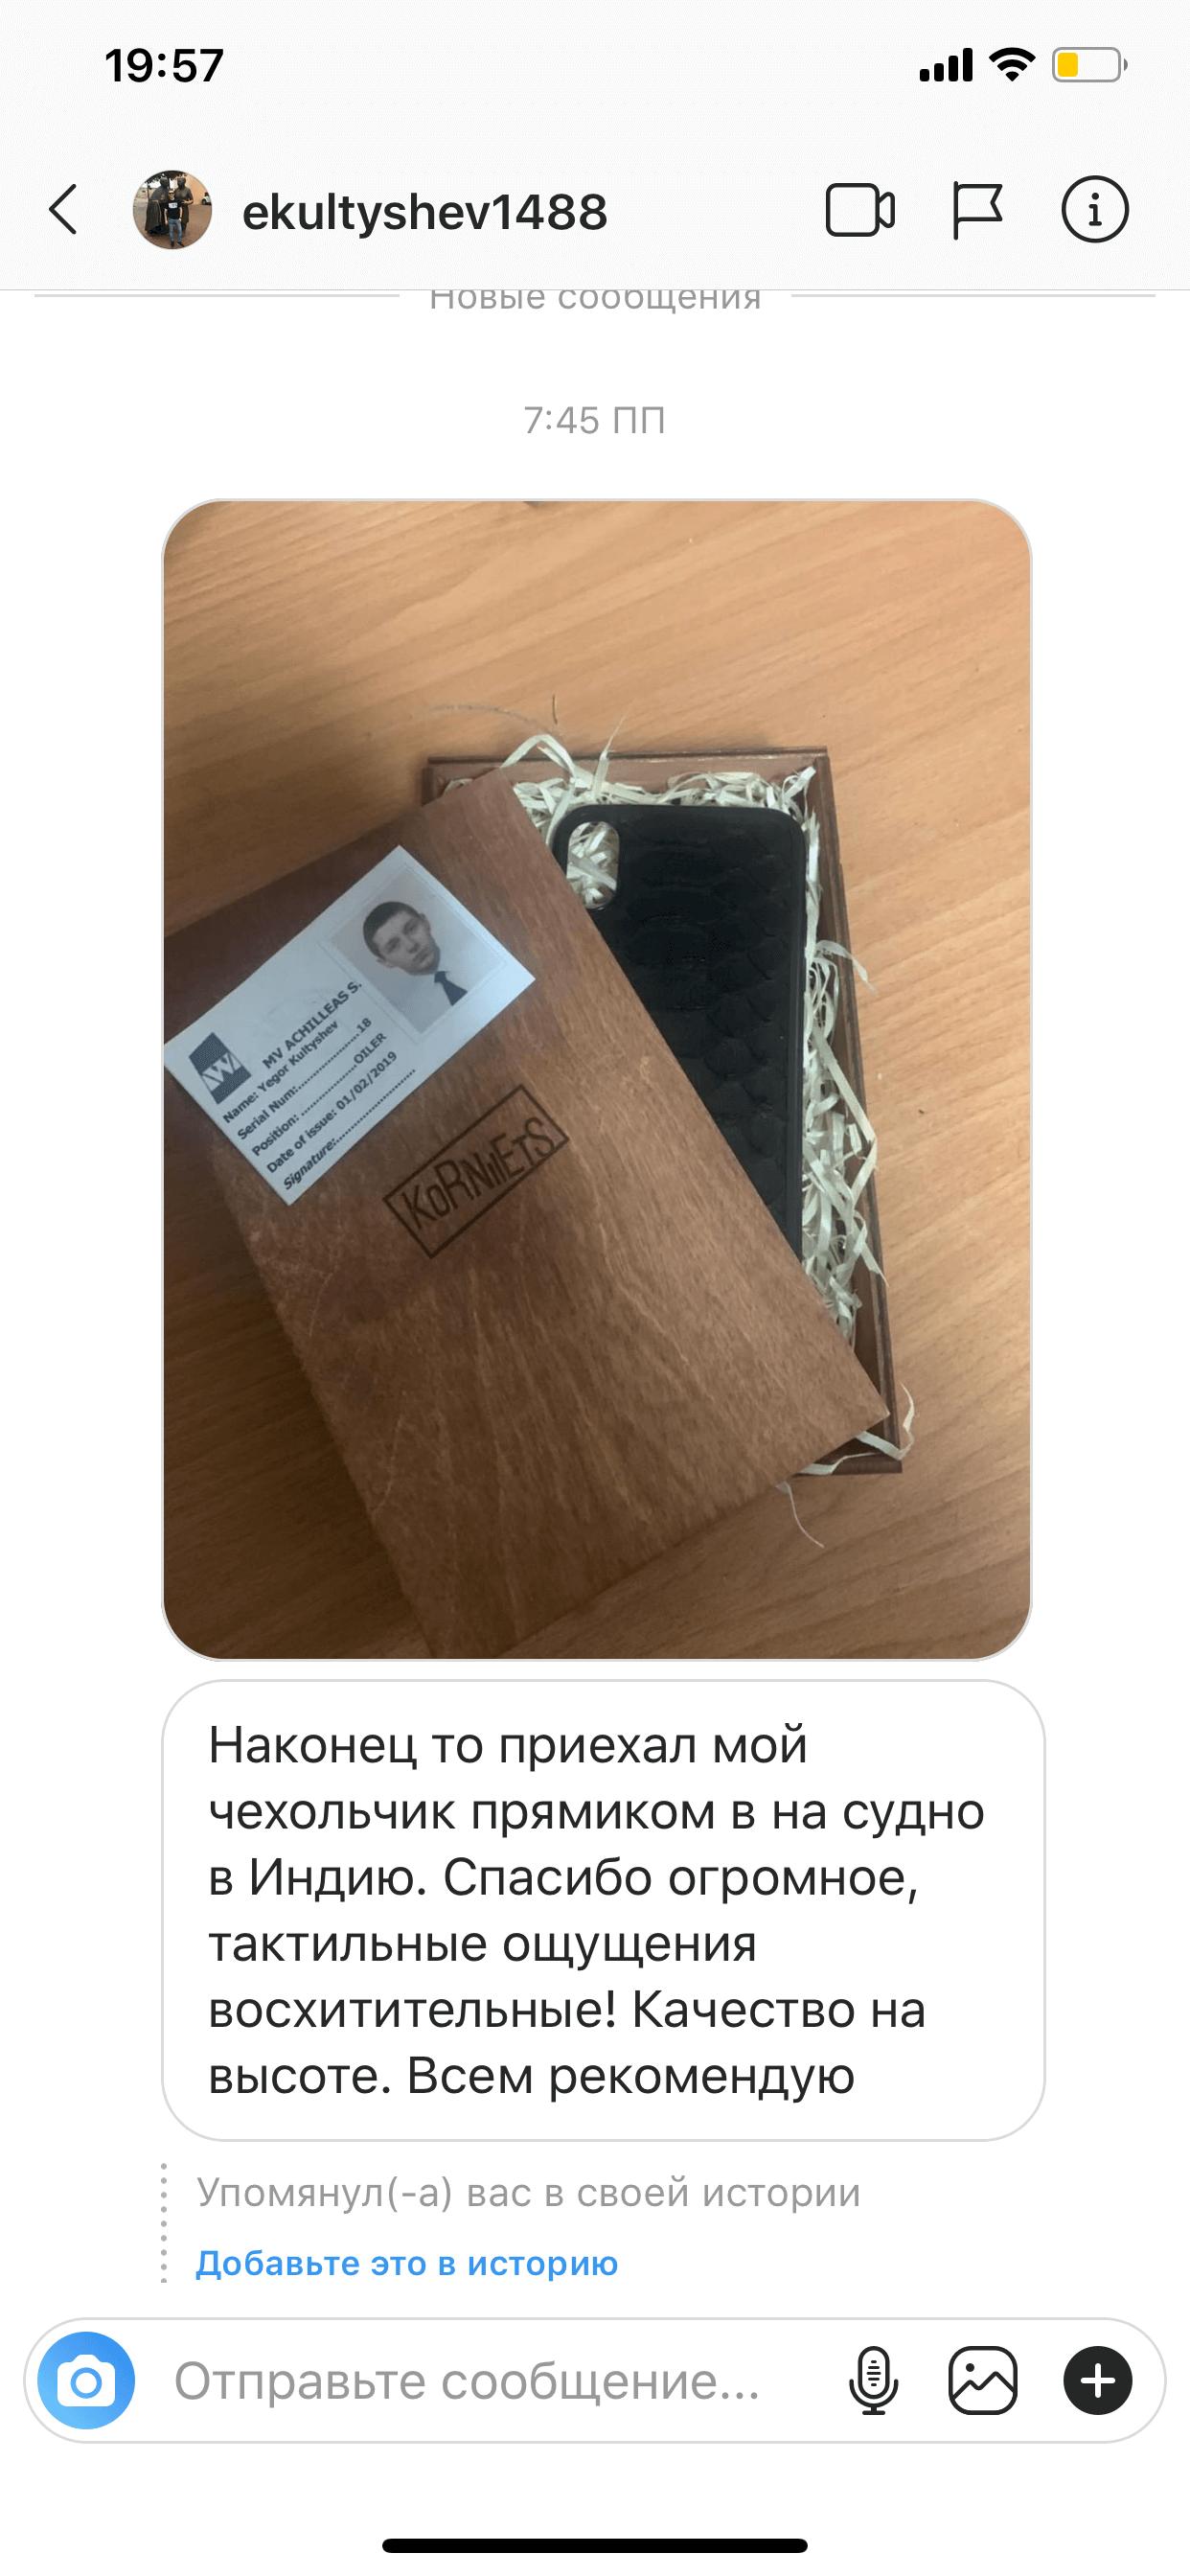 Image #1 from ekyltyshev1488